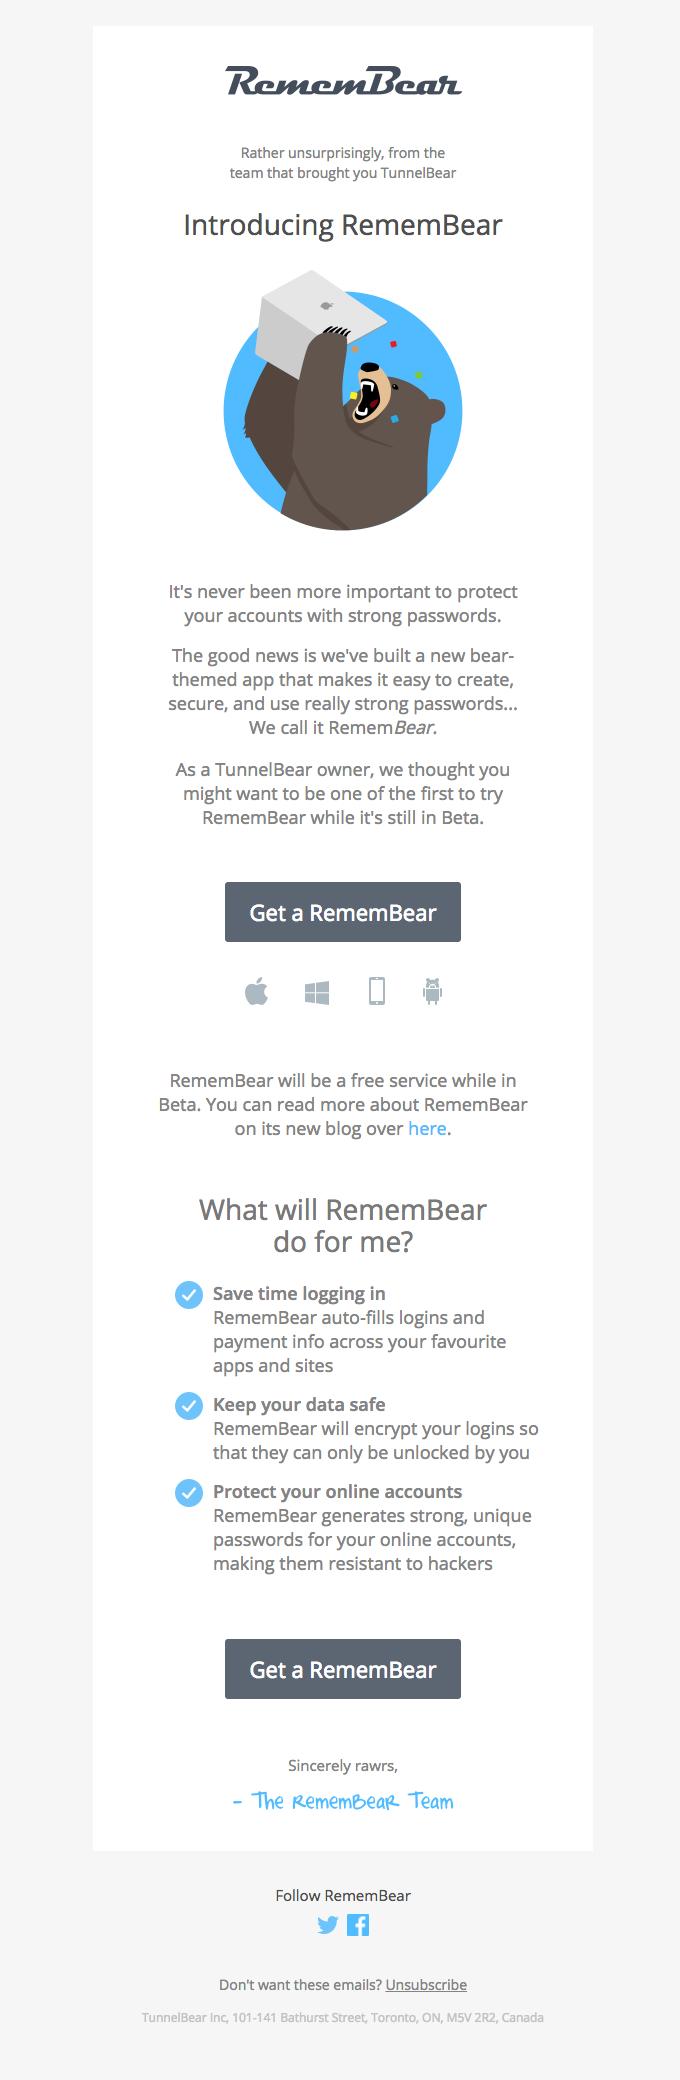 Introducing a new Bear…